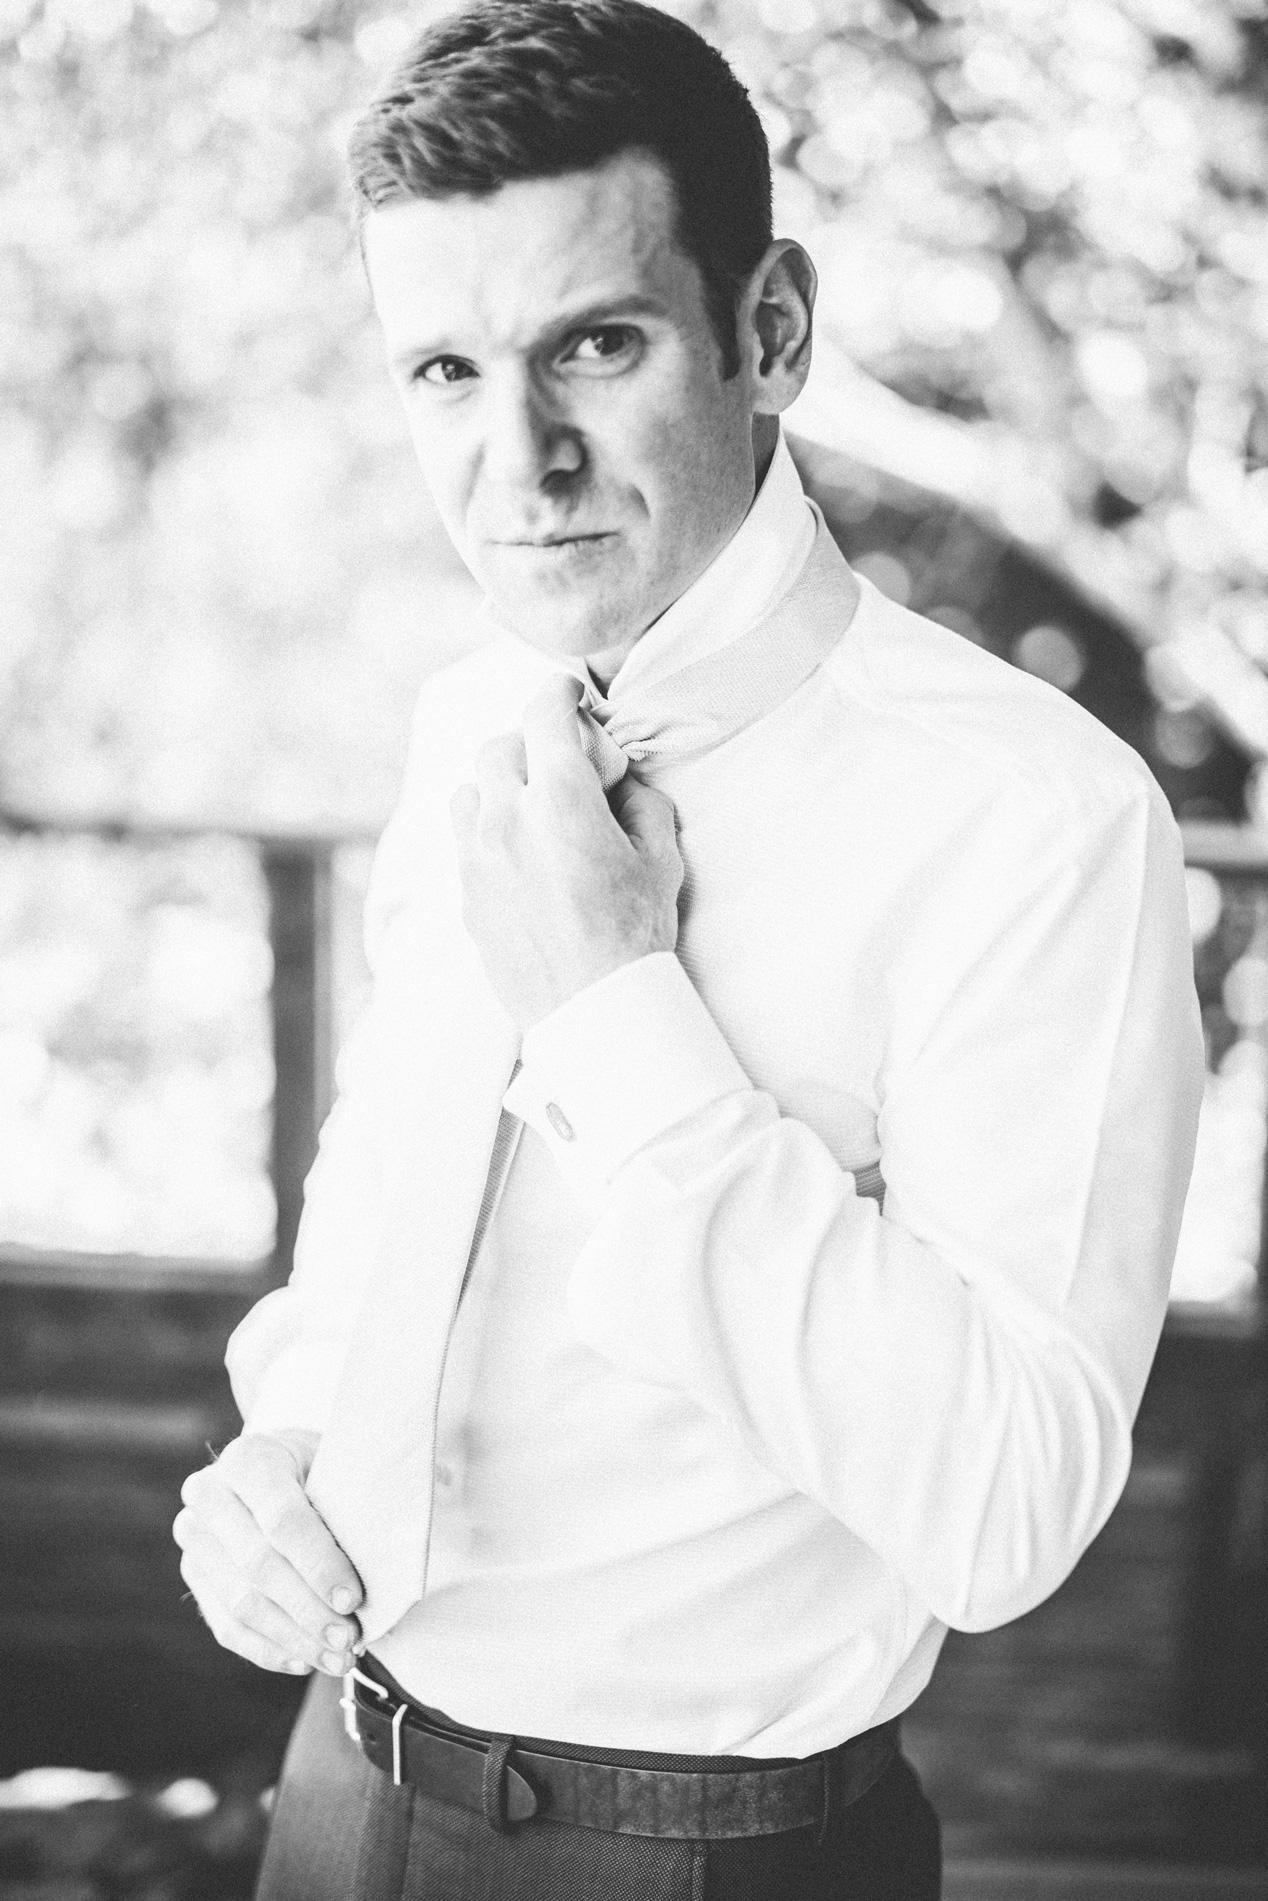 seattle-wedding-photographer-kyle-larson385